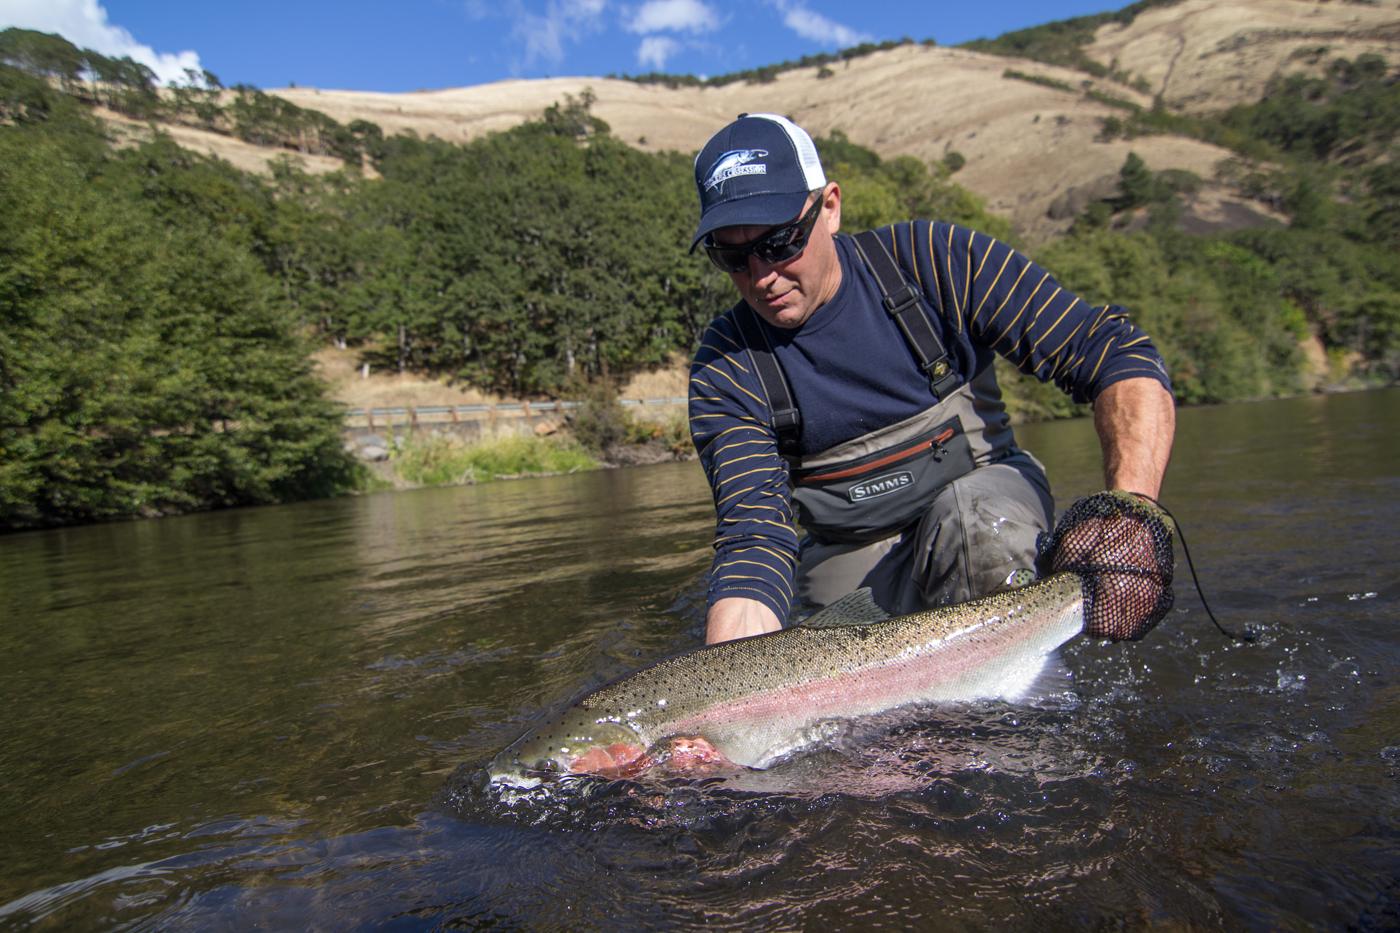 Klickitat river fly fishing report 11 10 17 for Fly fishing blog